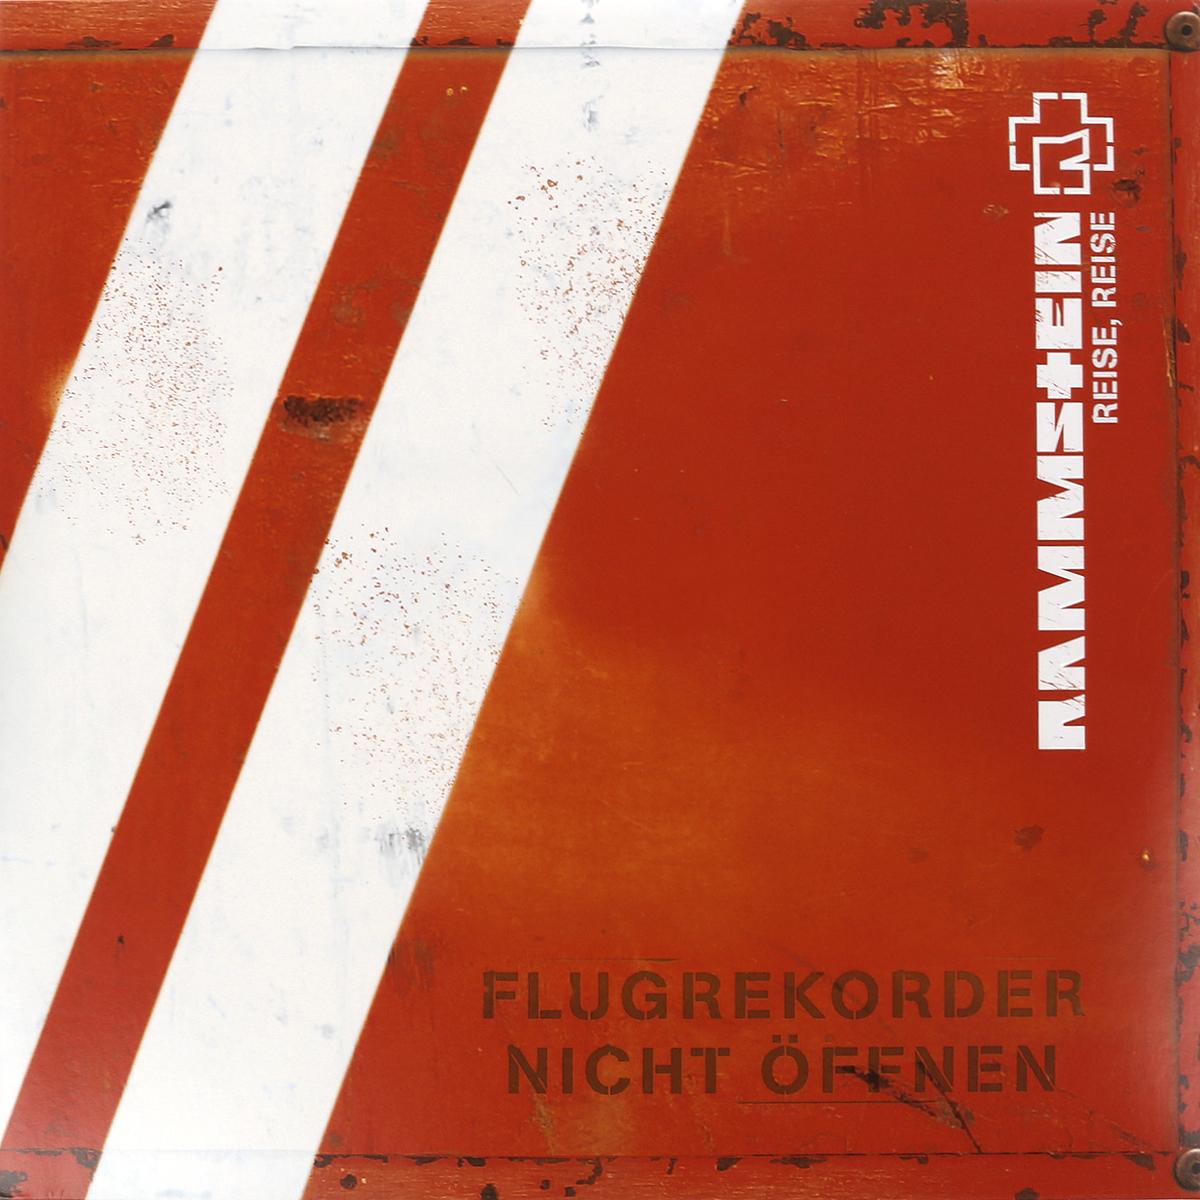 цена на Rammstein Rammstein. Reise, Reise (2 LP)